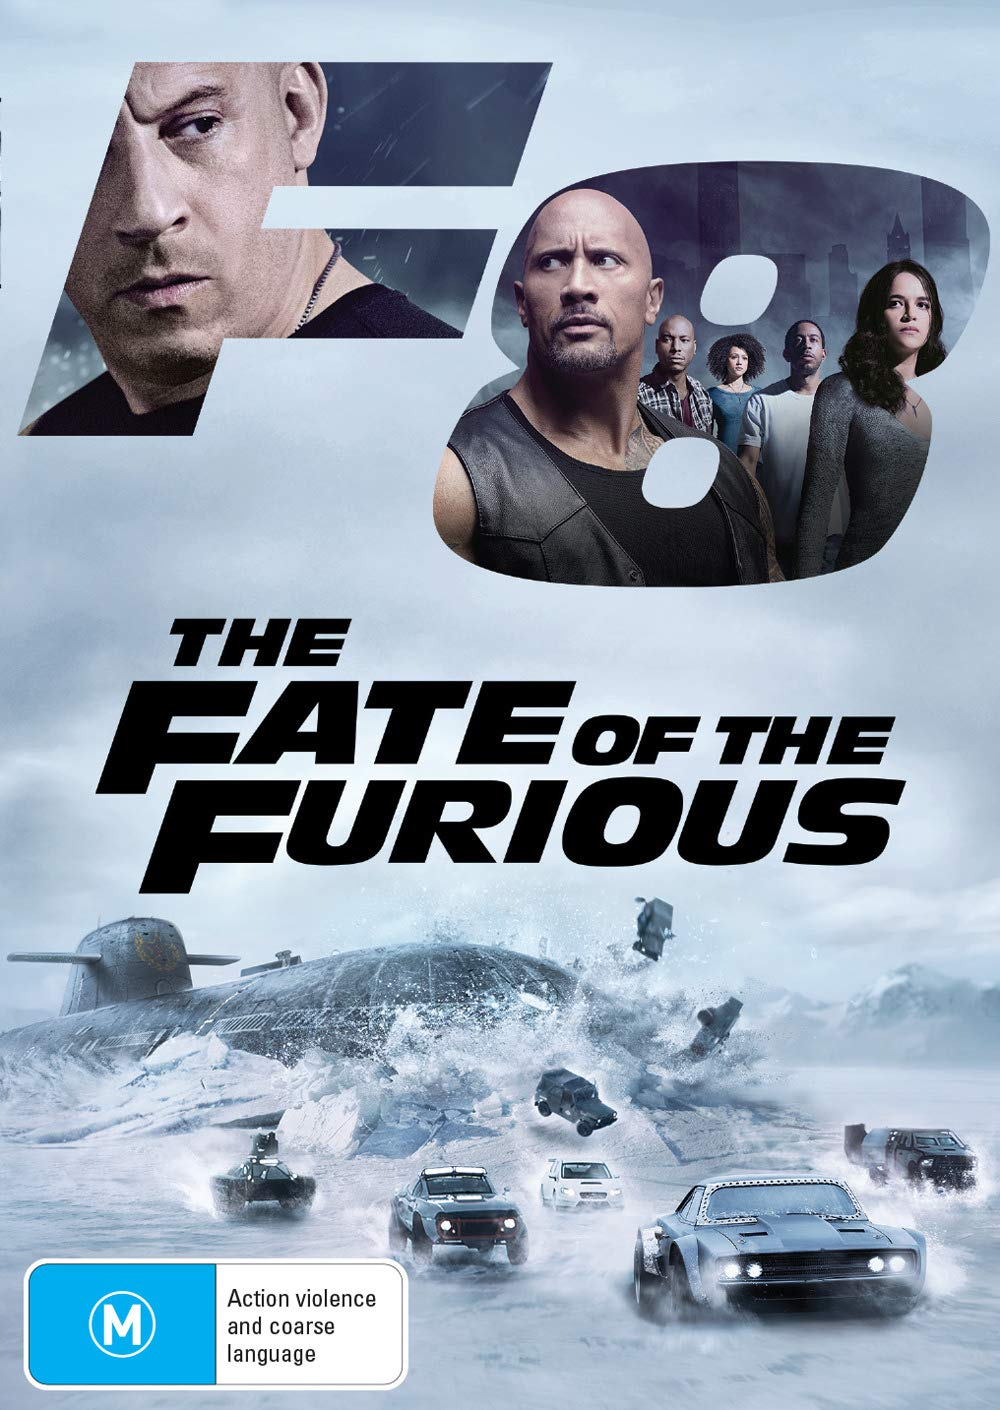 Amazon.com: Fast & Furious 8 [DVD]: Dwayne Johnson, Michelle Rodriguez, Vin  Diesel, Jason Statham, F. Gary Gray: Movies & TV